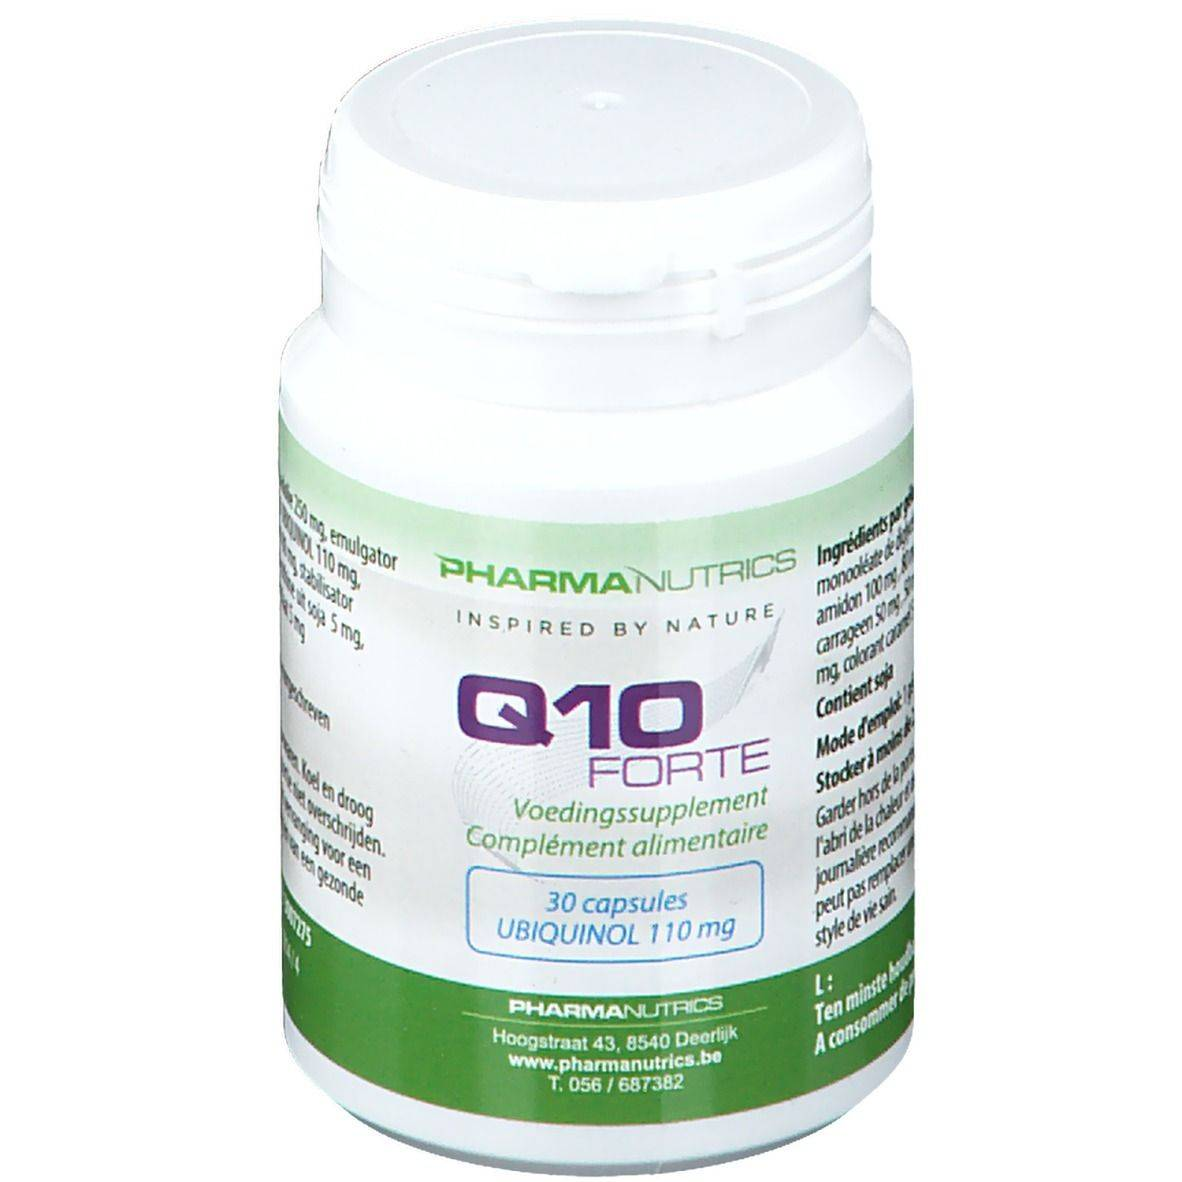 Pharmanutrics Q10 Forte pc(s) capsule(s)